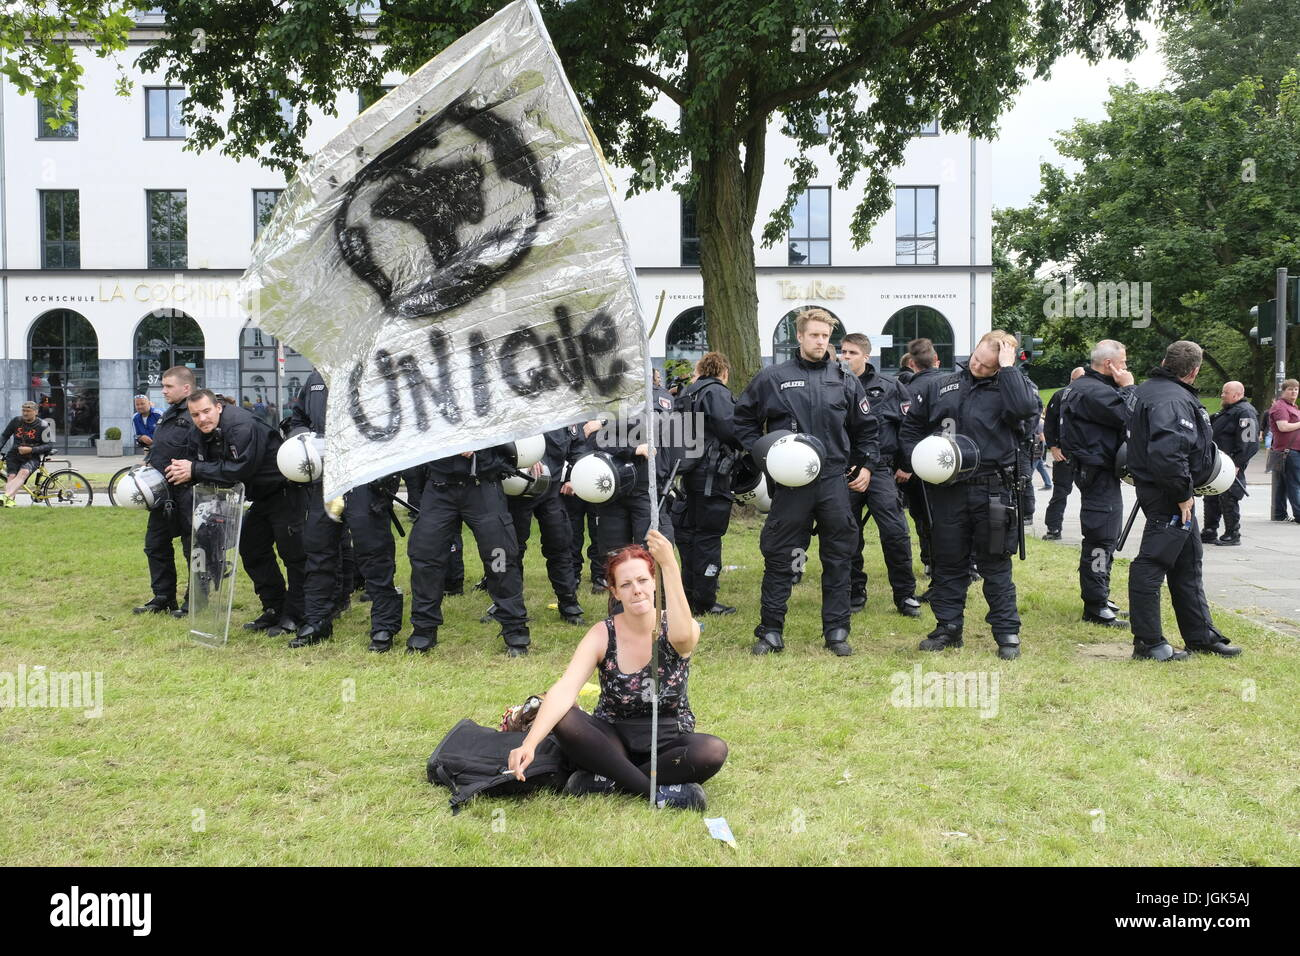 A J Hamburg hamburg germany 08th july 2017 large anti g20 demonstration in